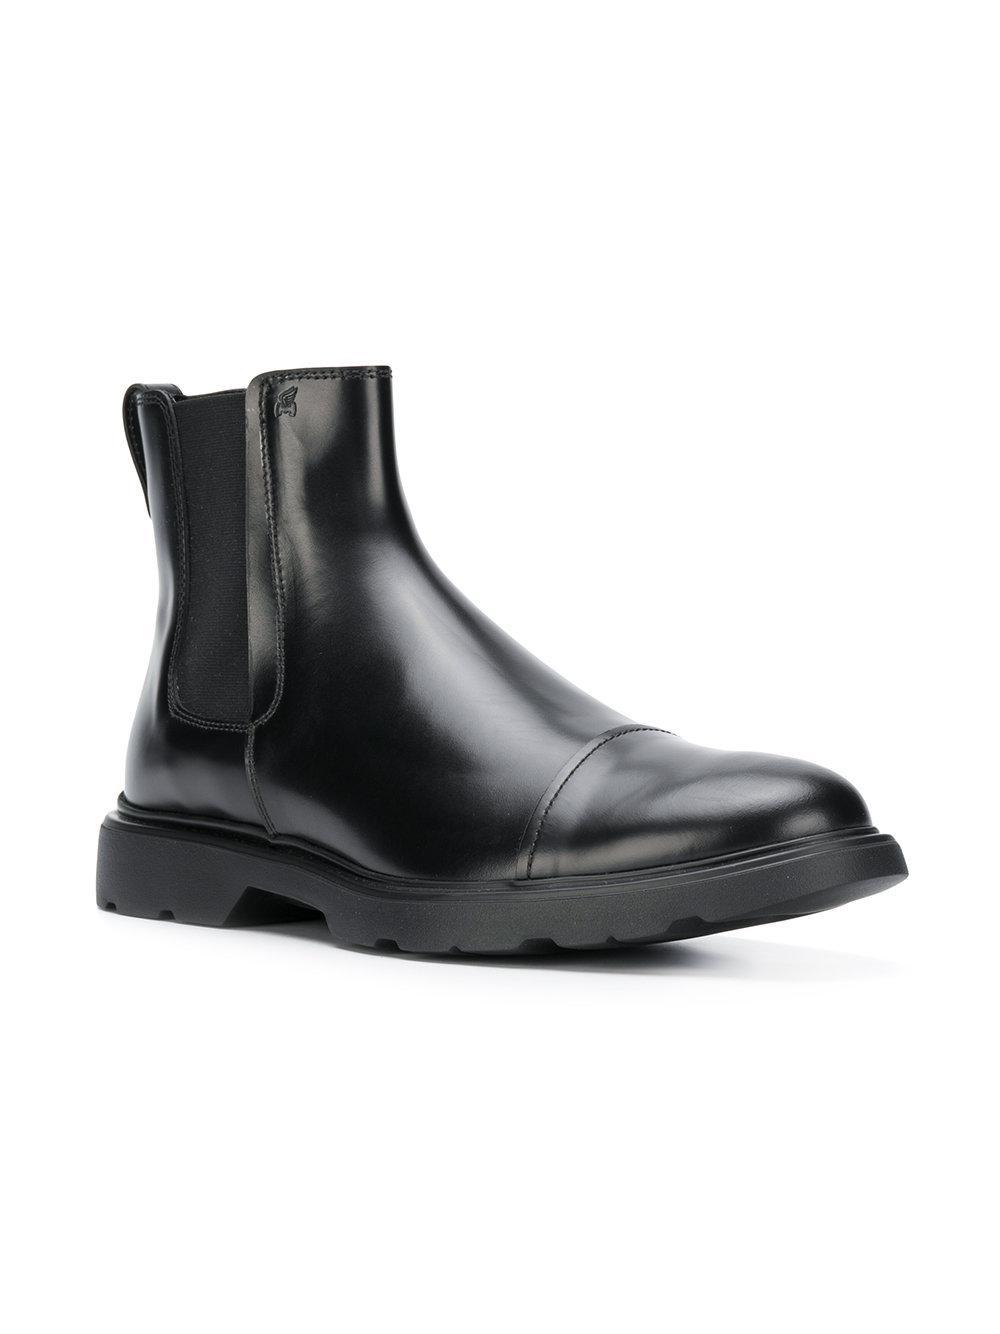 858fe23c7492e Lyst - Hogan Ankle Boots in Black for Men